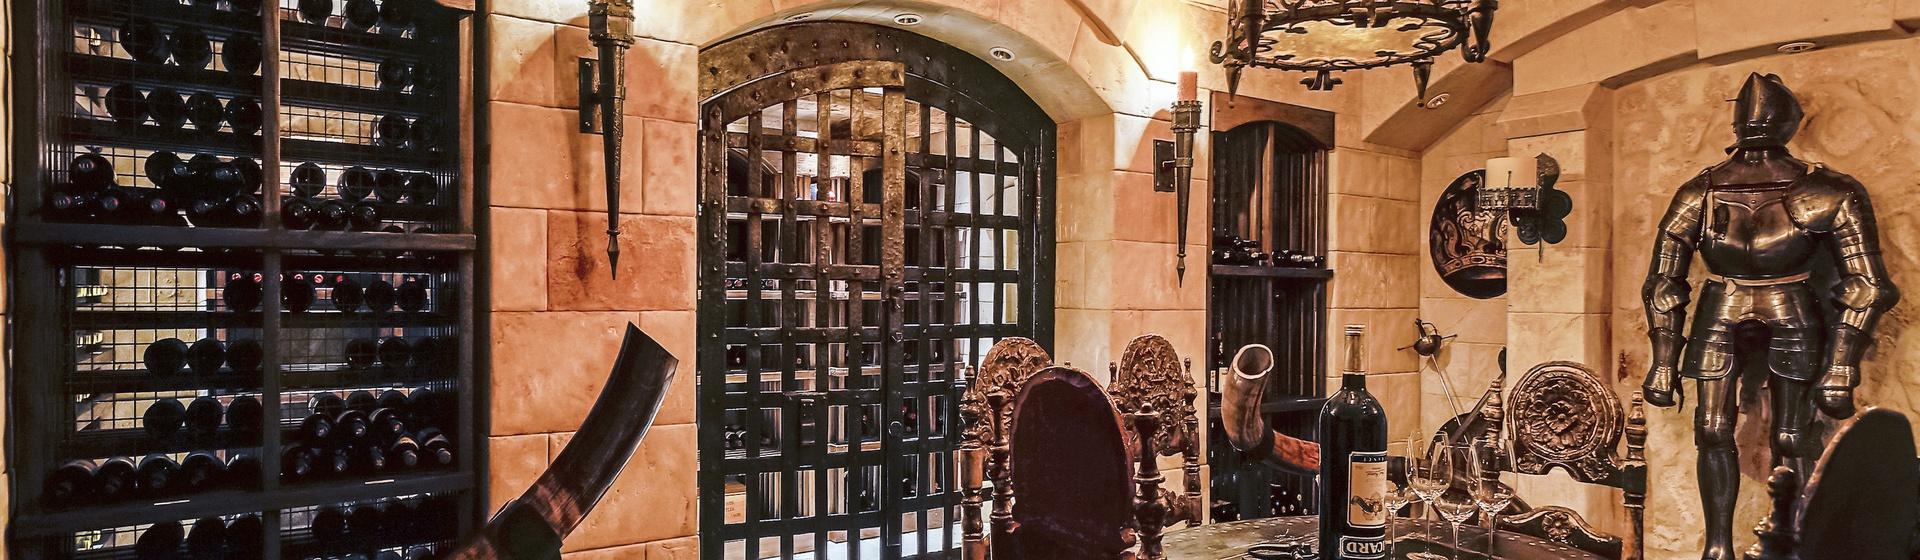 10.2-Telluride-Sleeping-Indian-Ranch-wine-cellar-web.JPG